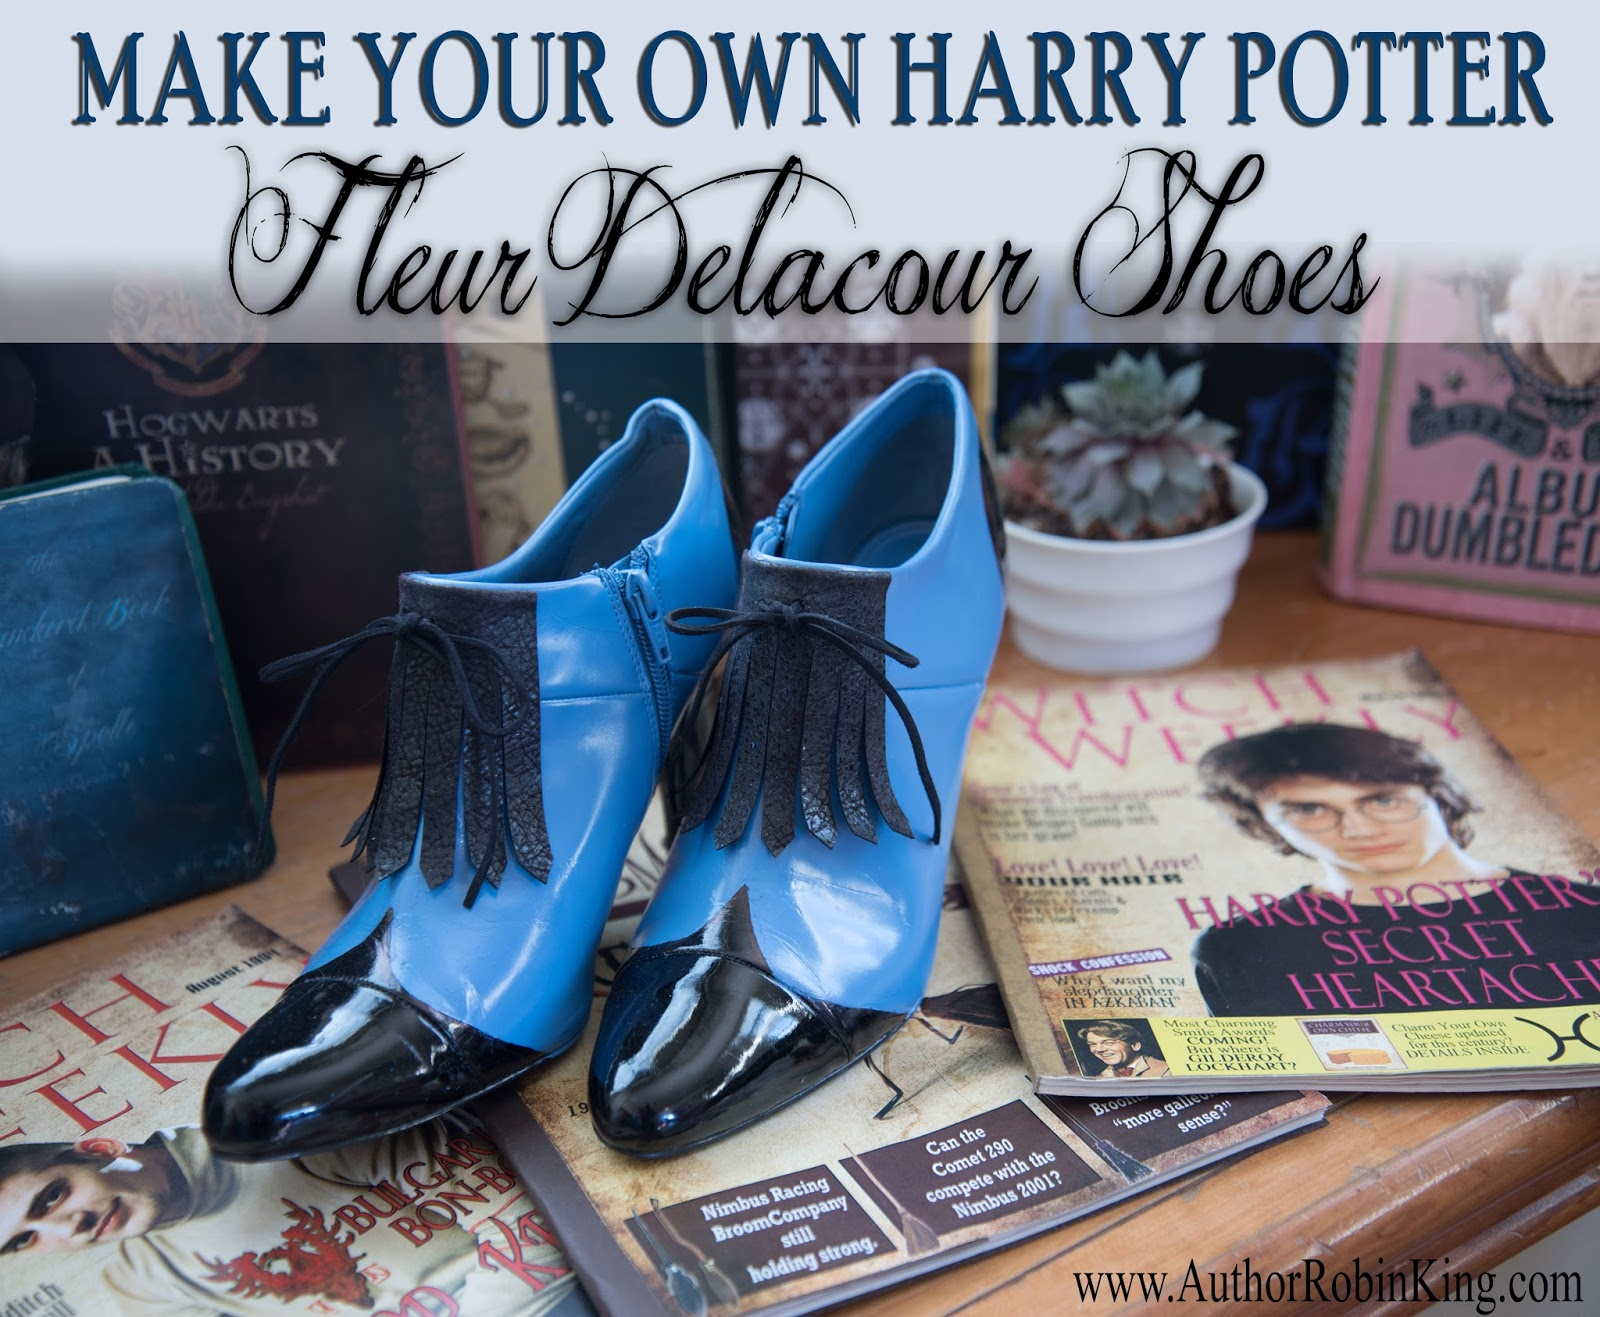 author robin king blog diy harry potter fleur delacour beauxbatons shoes. Black Bedroom Furniture Sets. Home Design Ideas